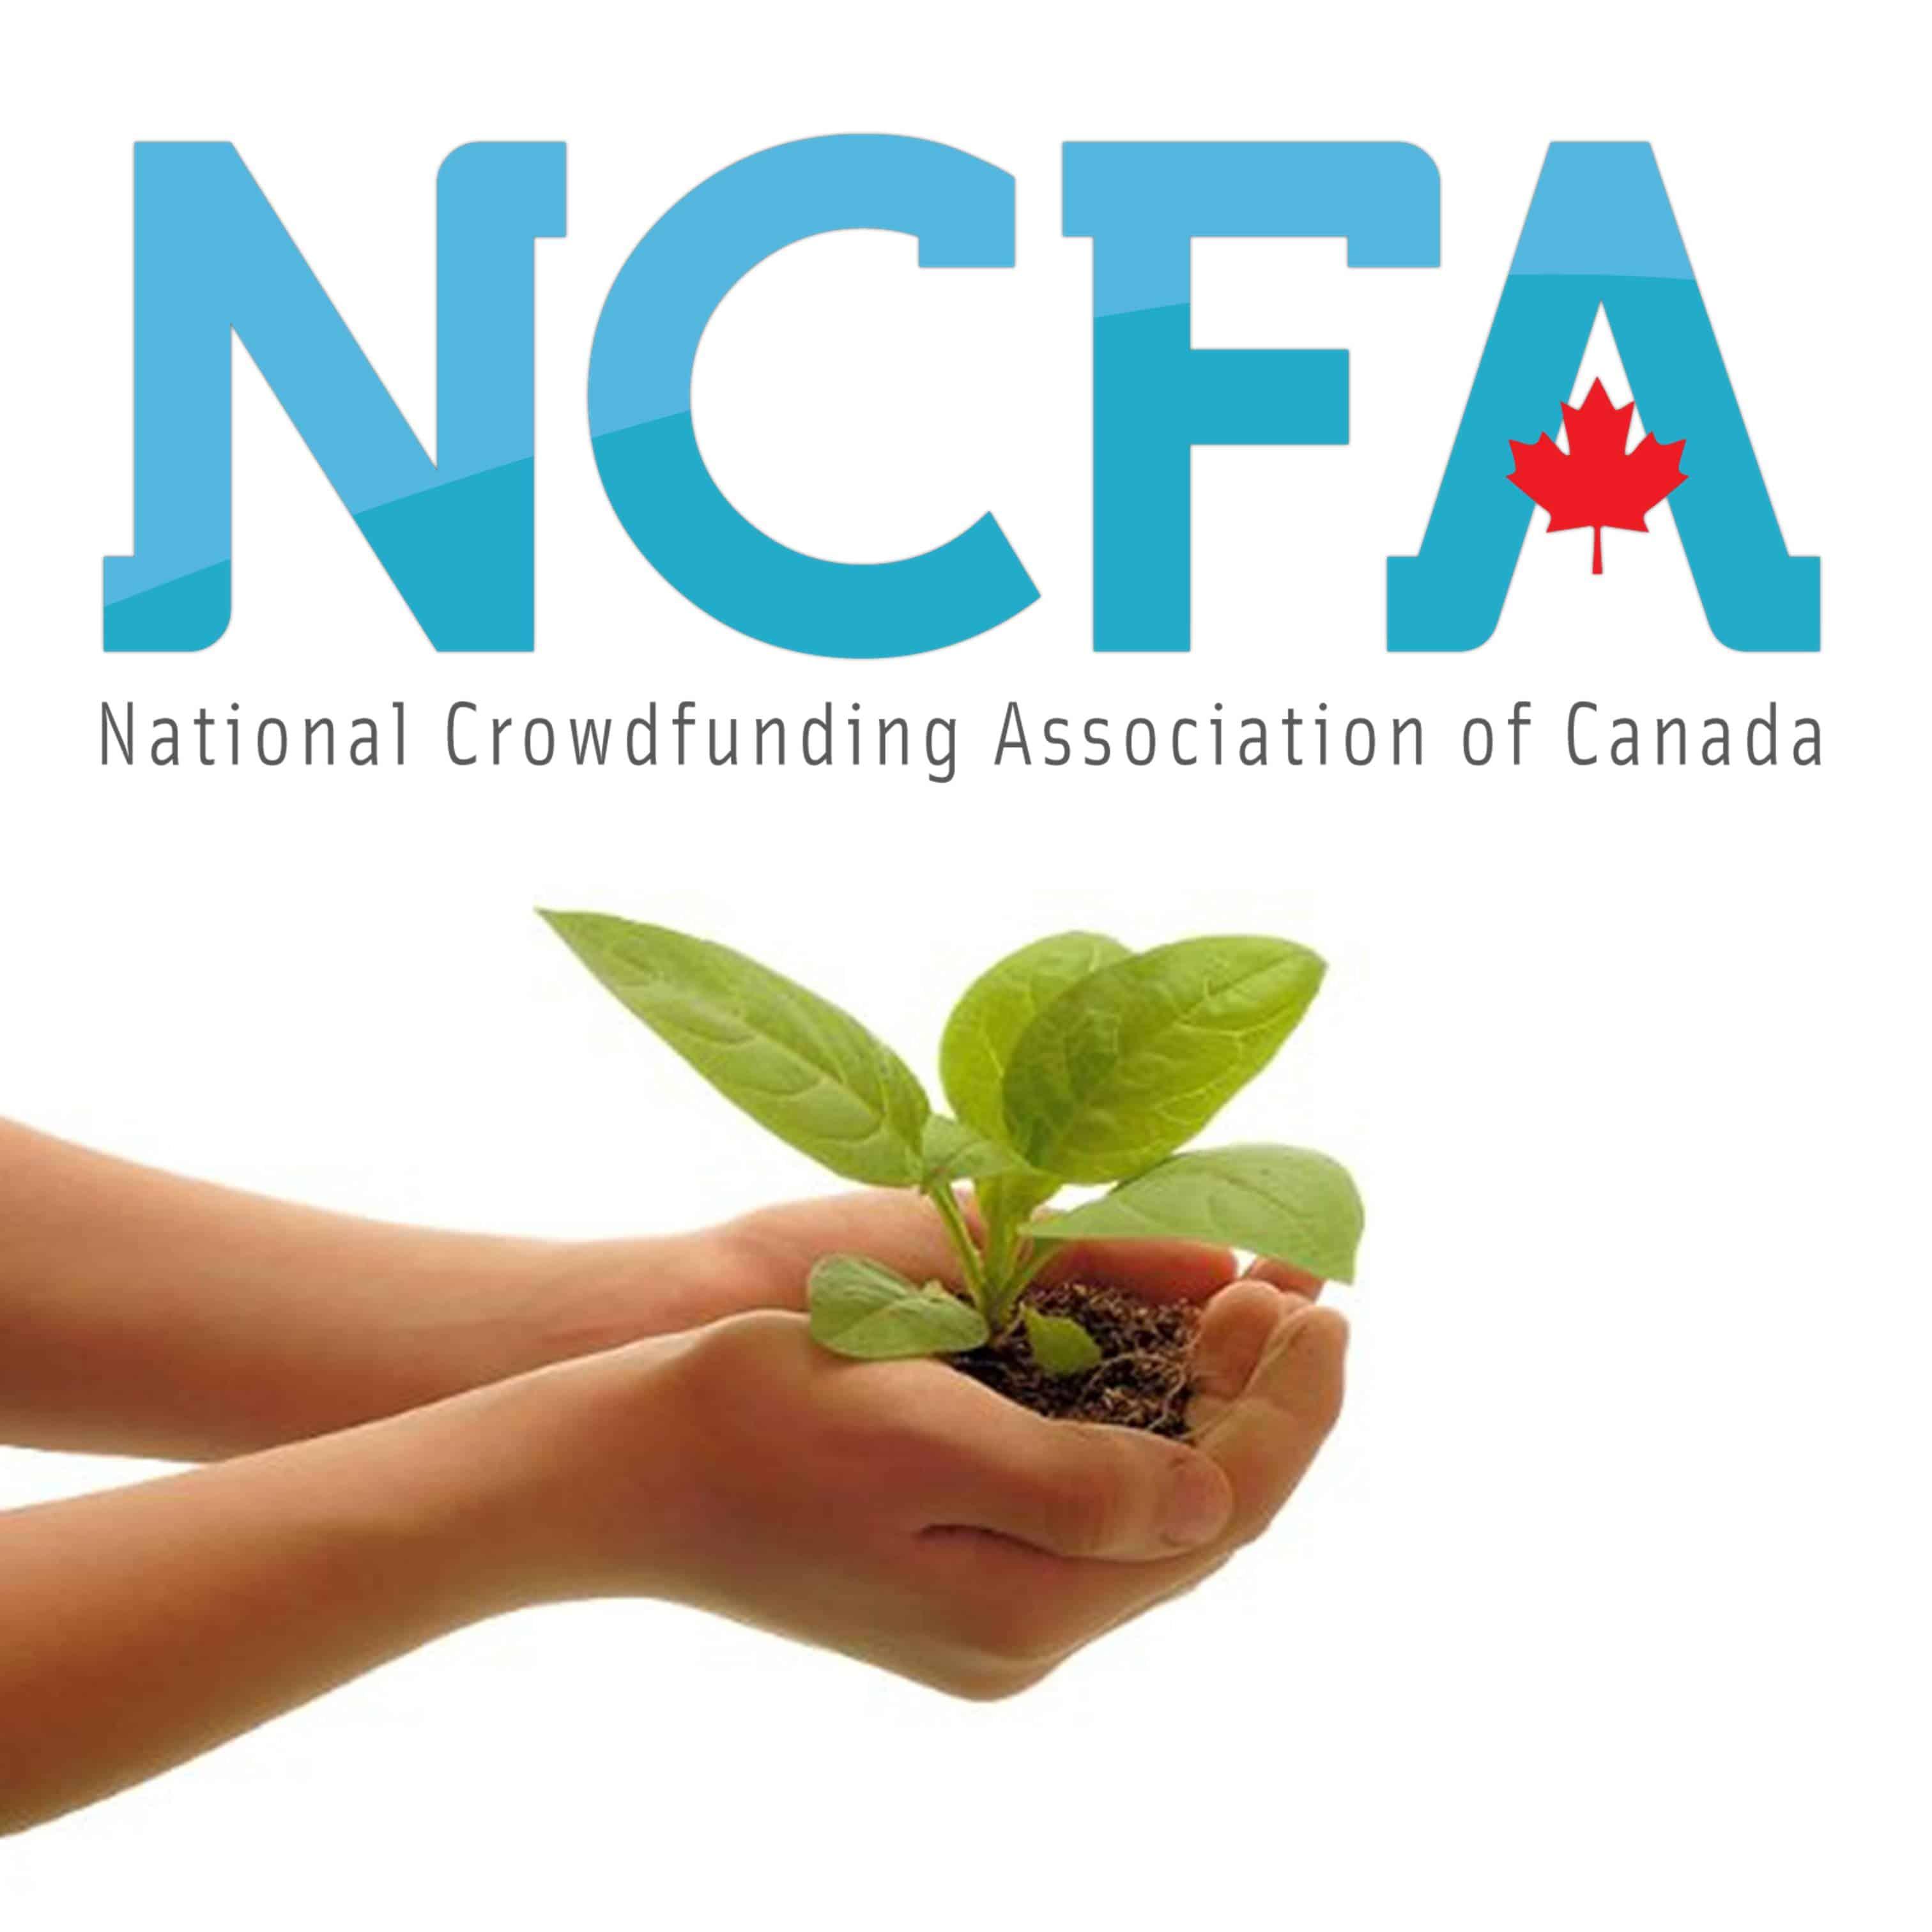 NCFA Canada Applauds Regulators Approach on Crowdfunding